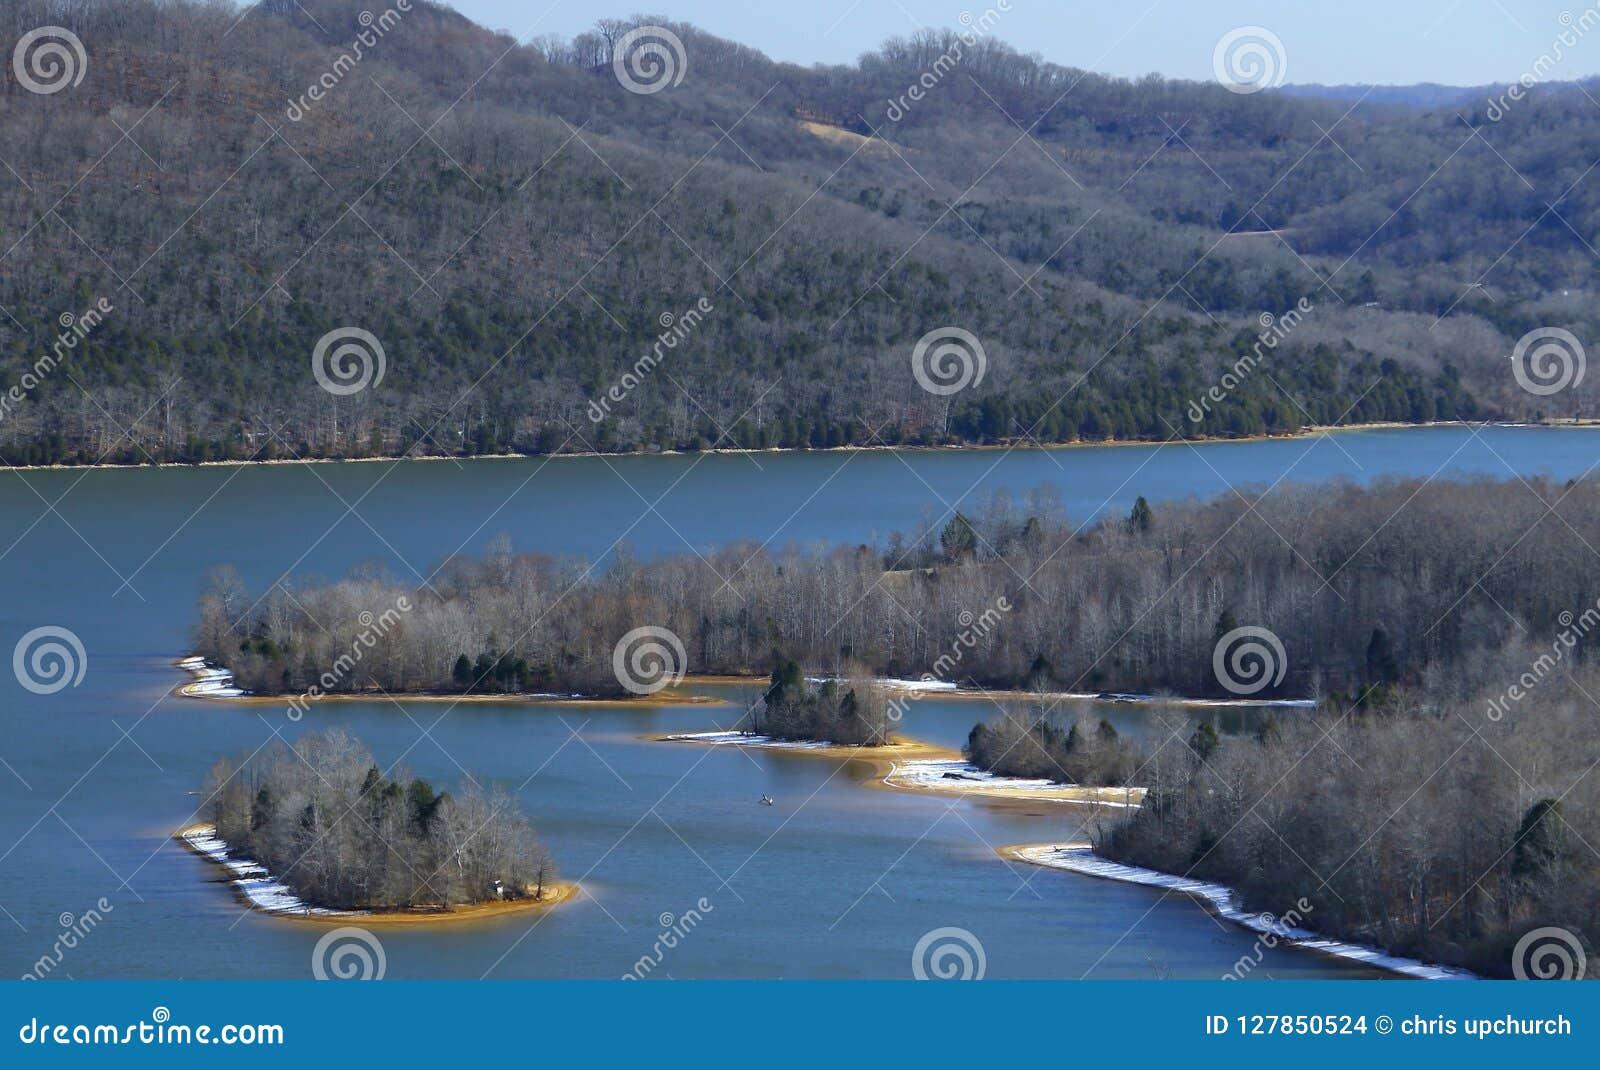 Beautiful cordell hull lake in the winter